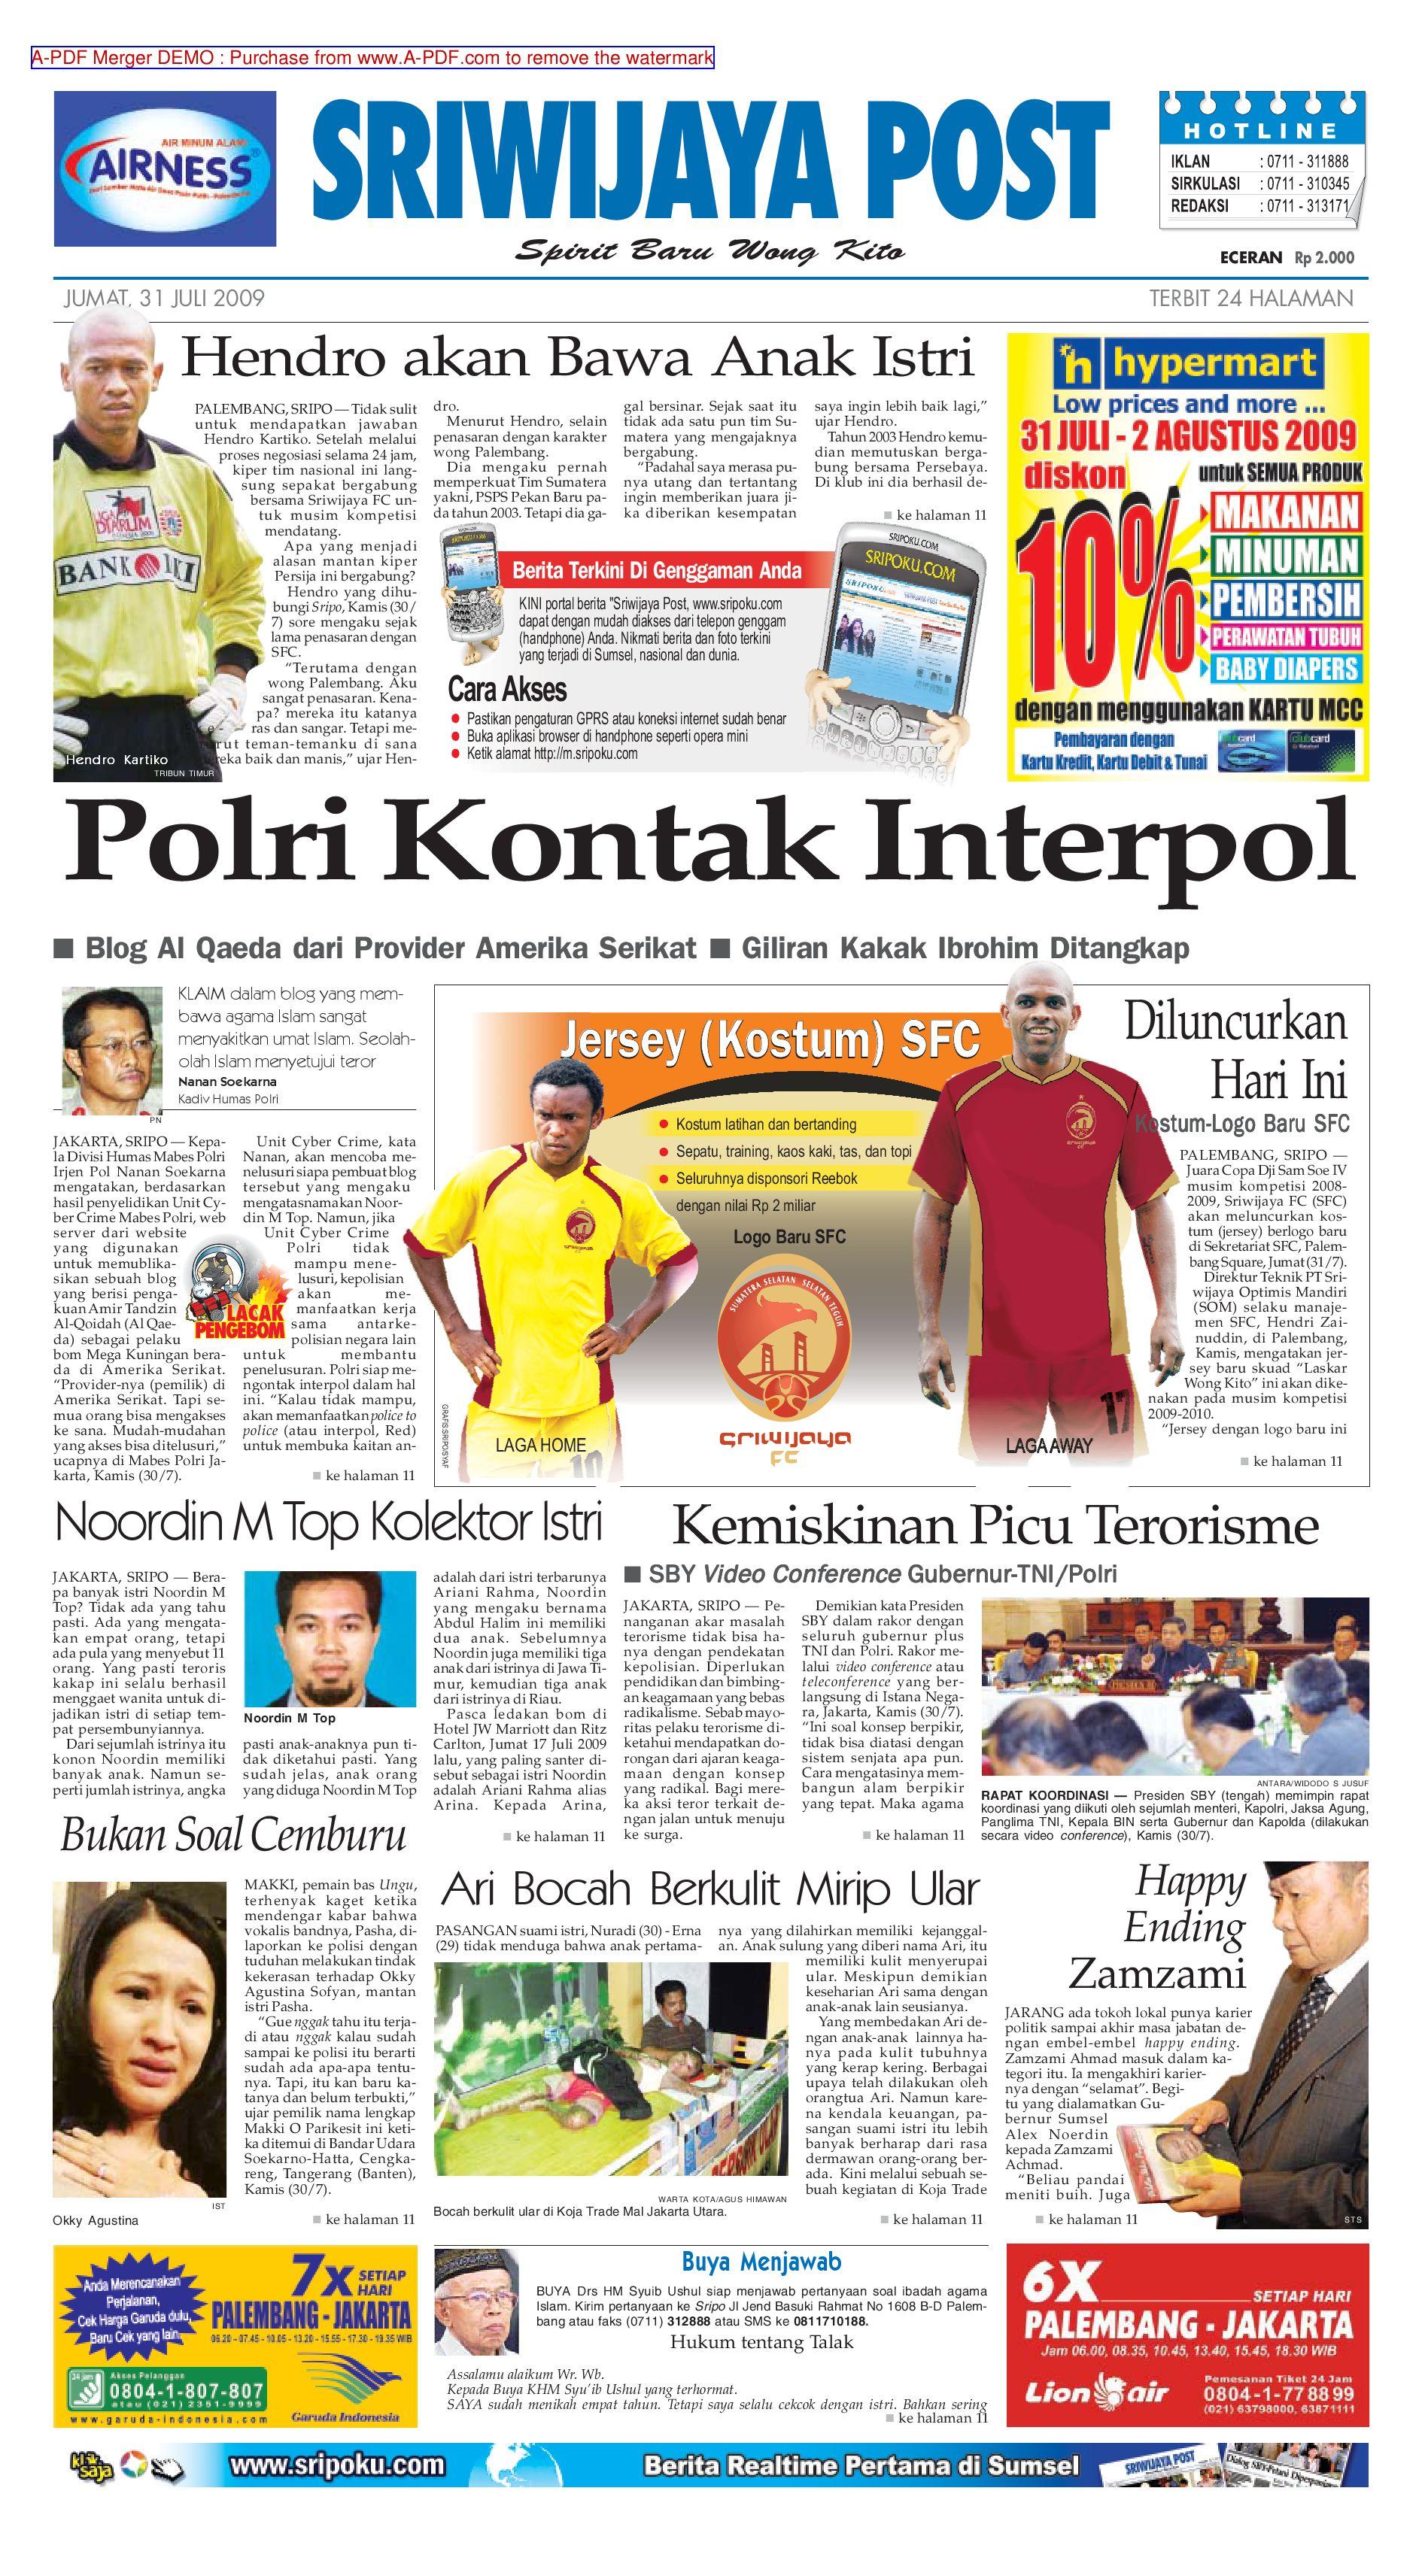 Sriwijaya Post Edisi Jumat 31 Juli 2009 By Yulius Saputra Issuu Rejeki Anak Soleh 3 Voucher Carrefour Rp 200000